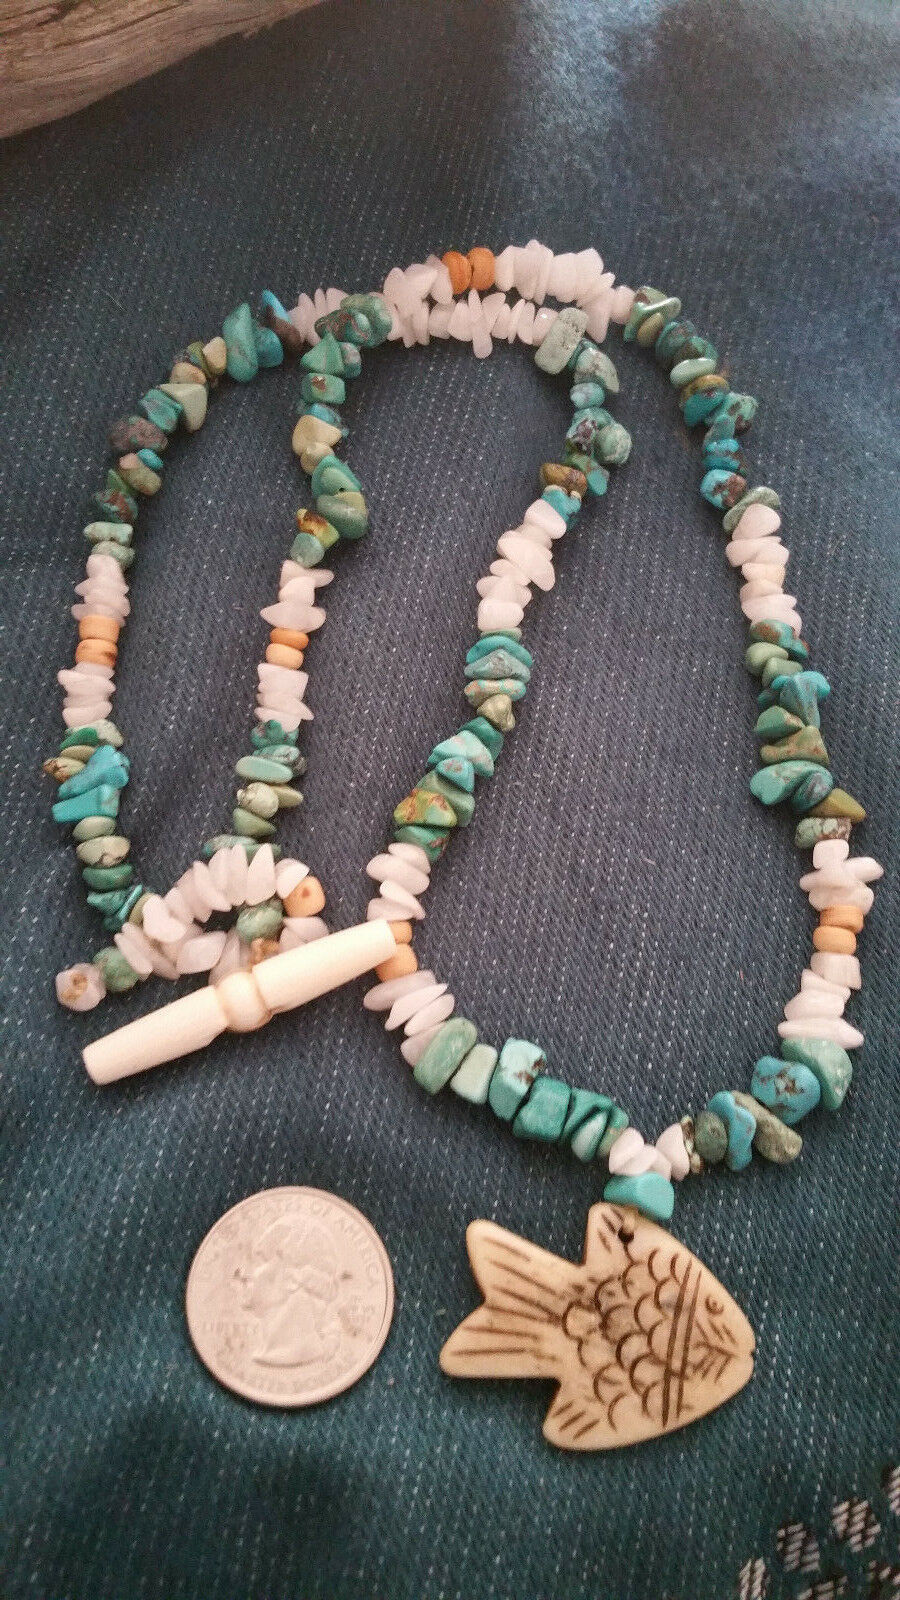 Old Mine Kingman's Turquoise Necklace,w/ Milk quartz, Fish pendant Men or Women image 2